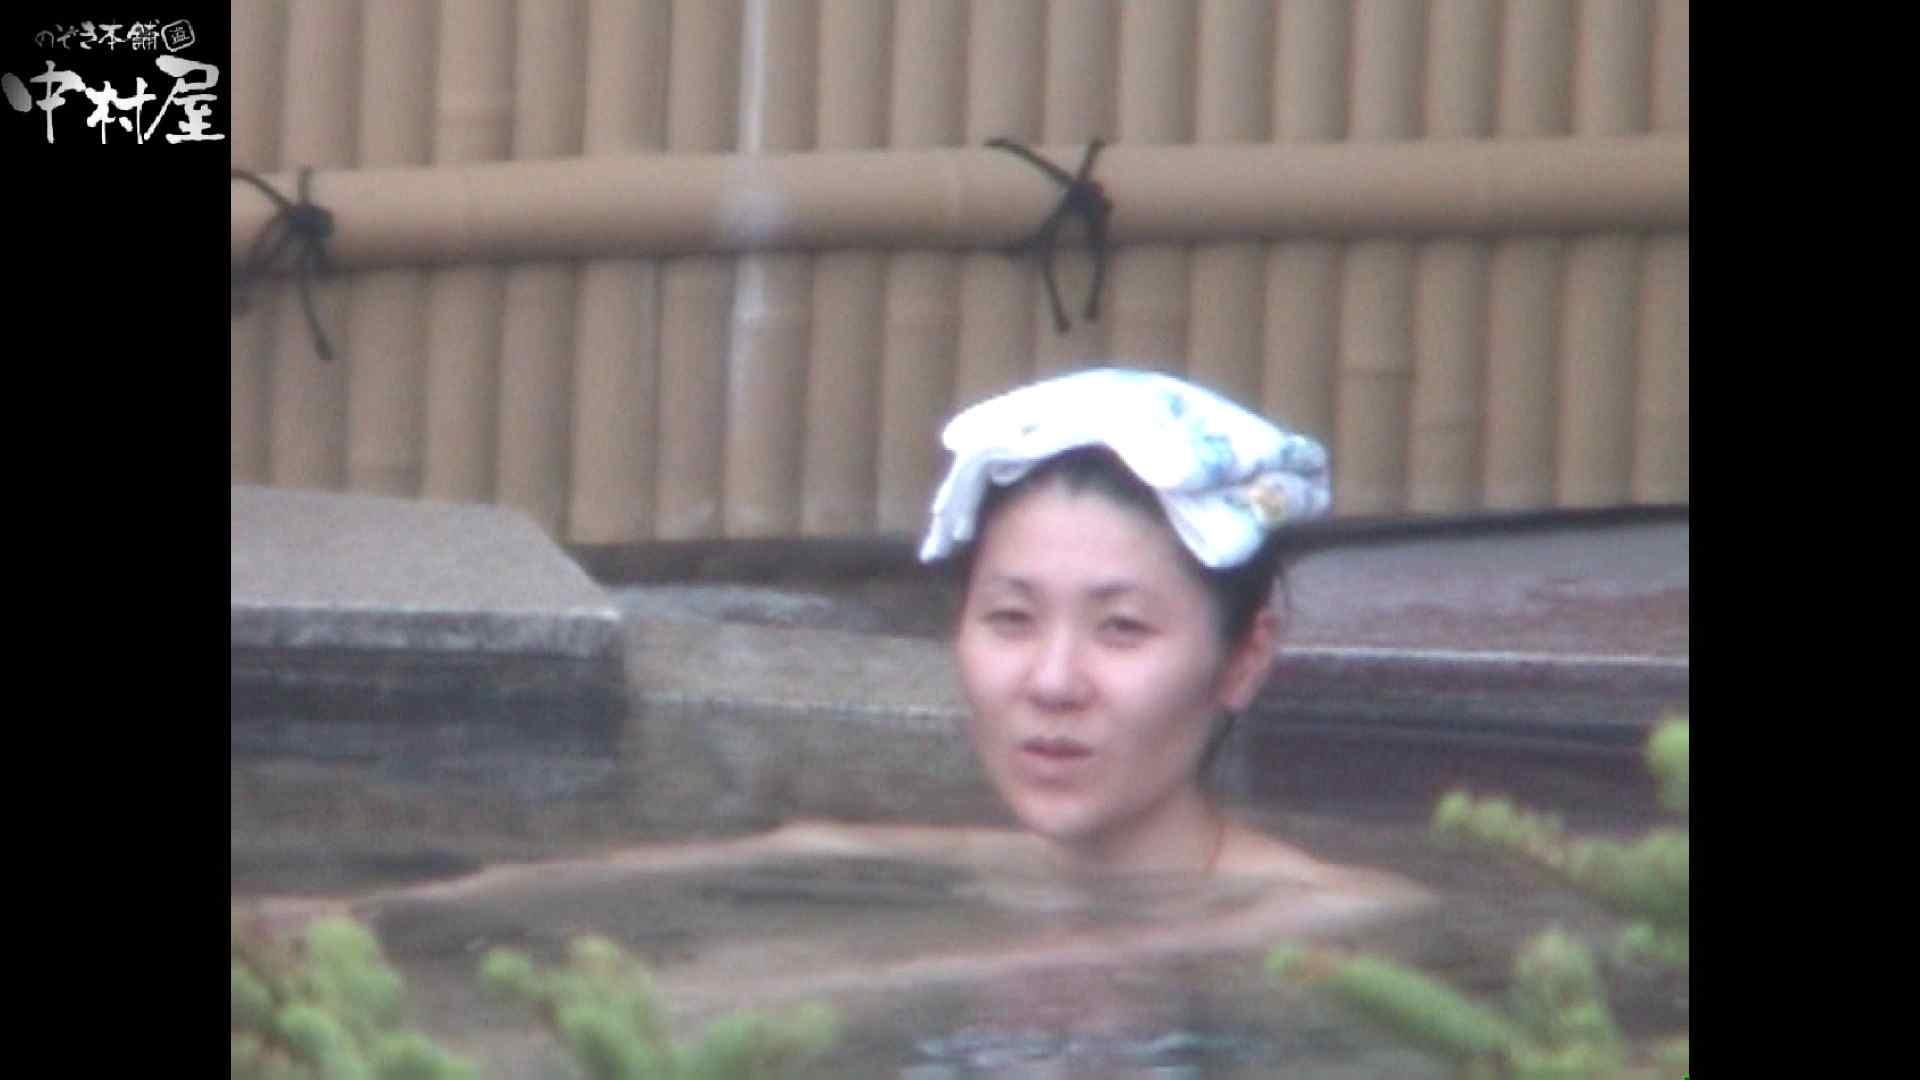 Aquaな露天風呂Vol.925 盗撮   HなOL  104pic 53